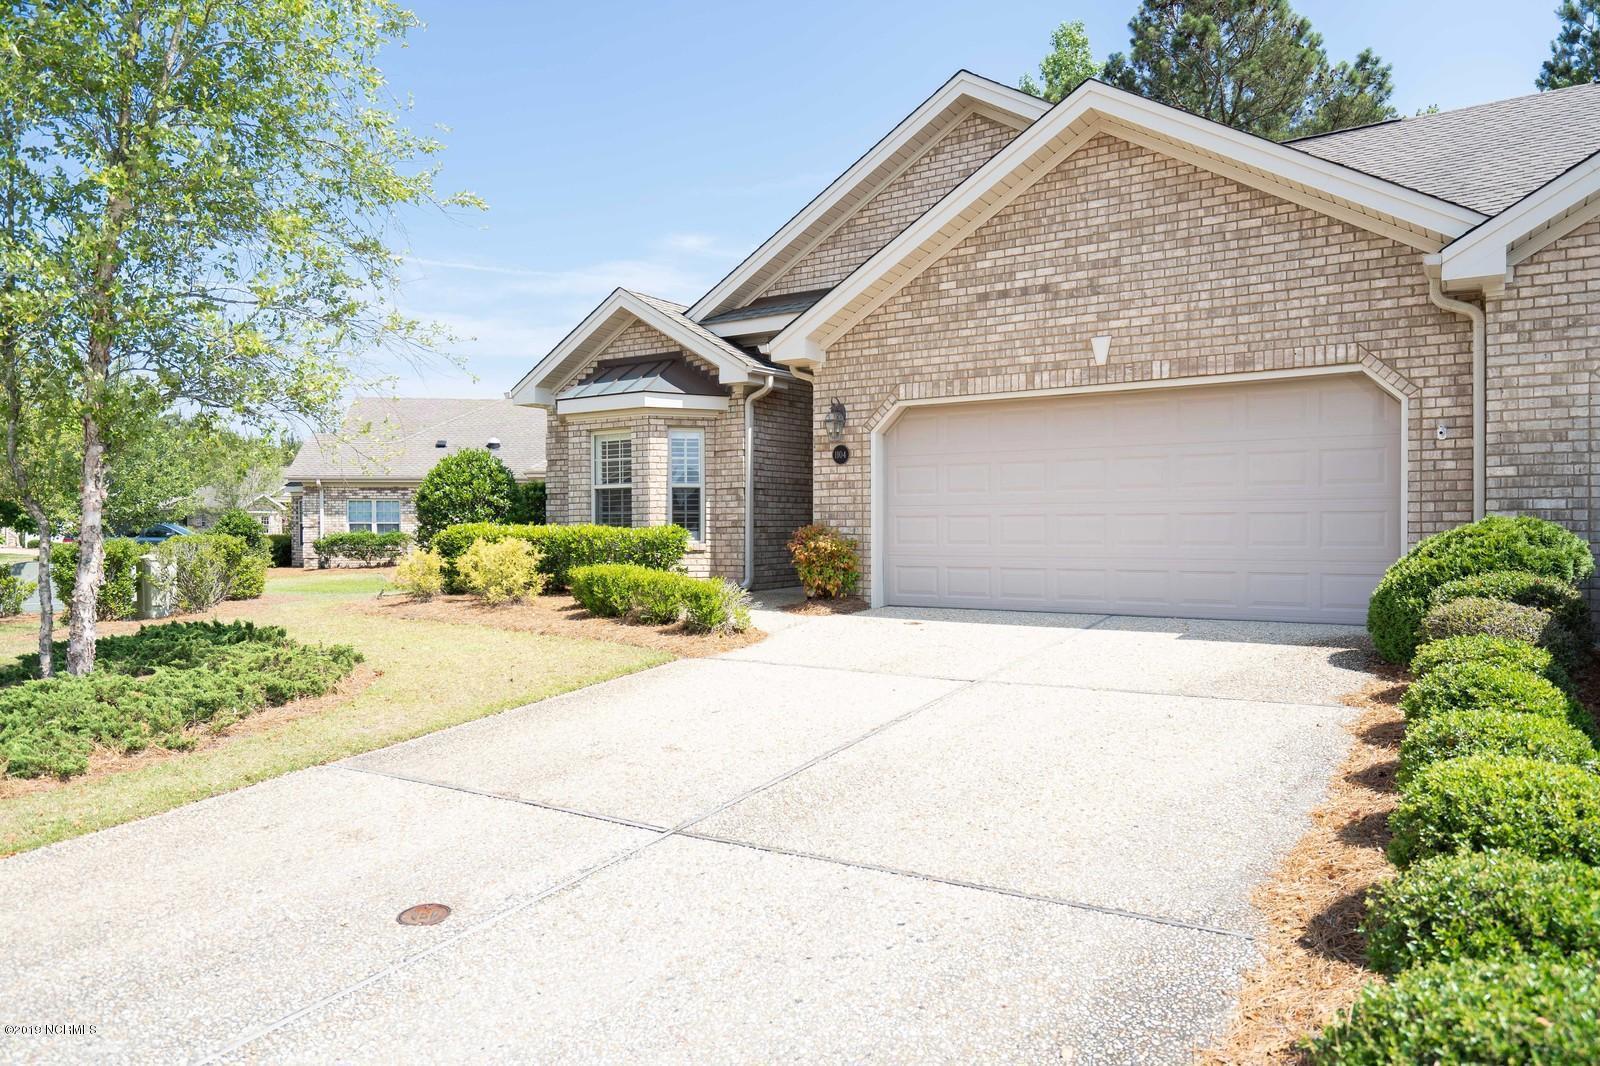 1104 Lillibridge Drive Leland, NC 28451